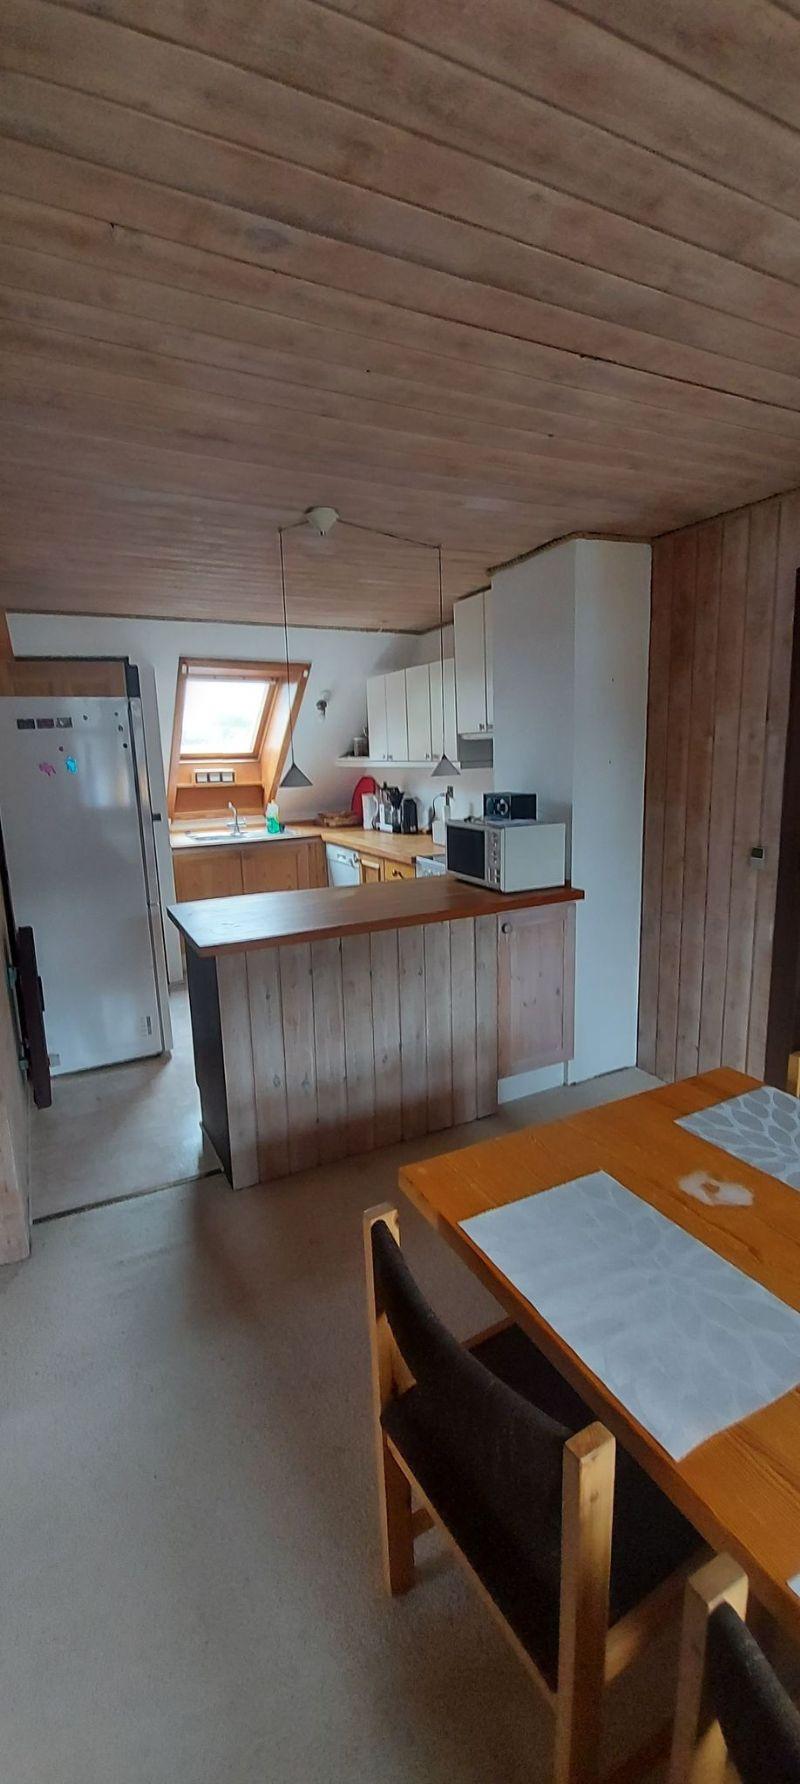 Ferienhaus 2643 - Hausfoto 5